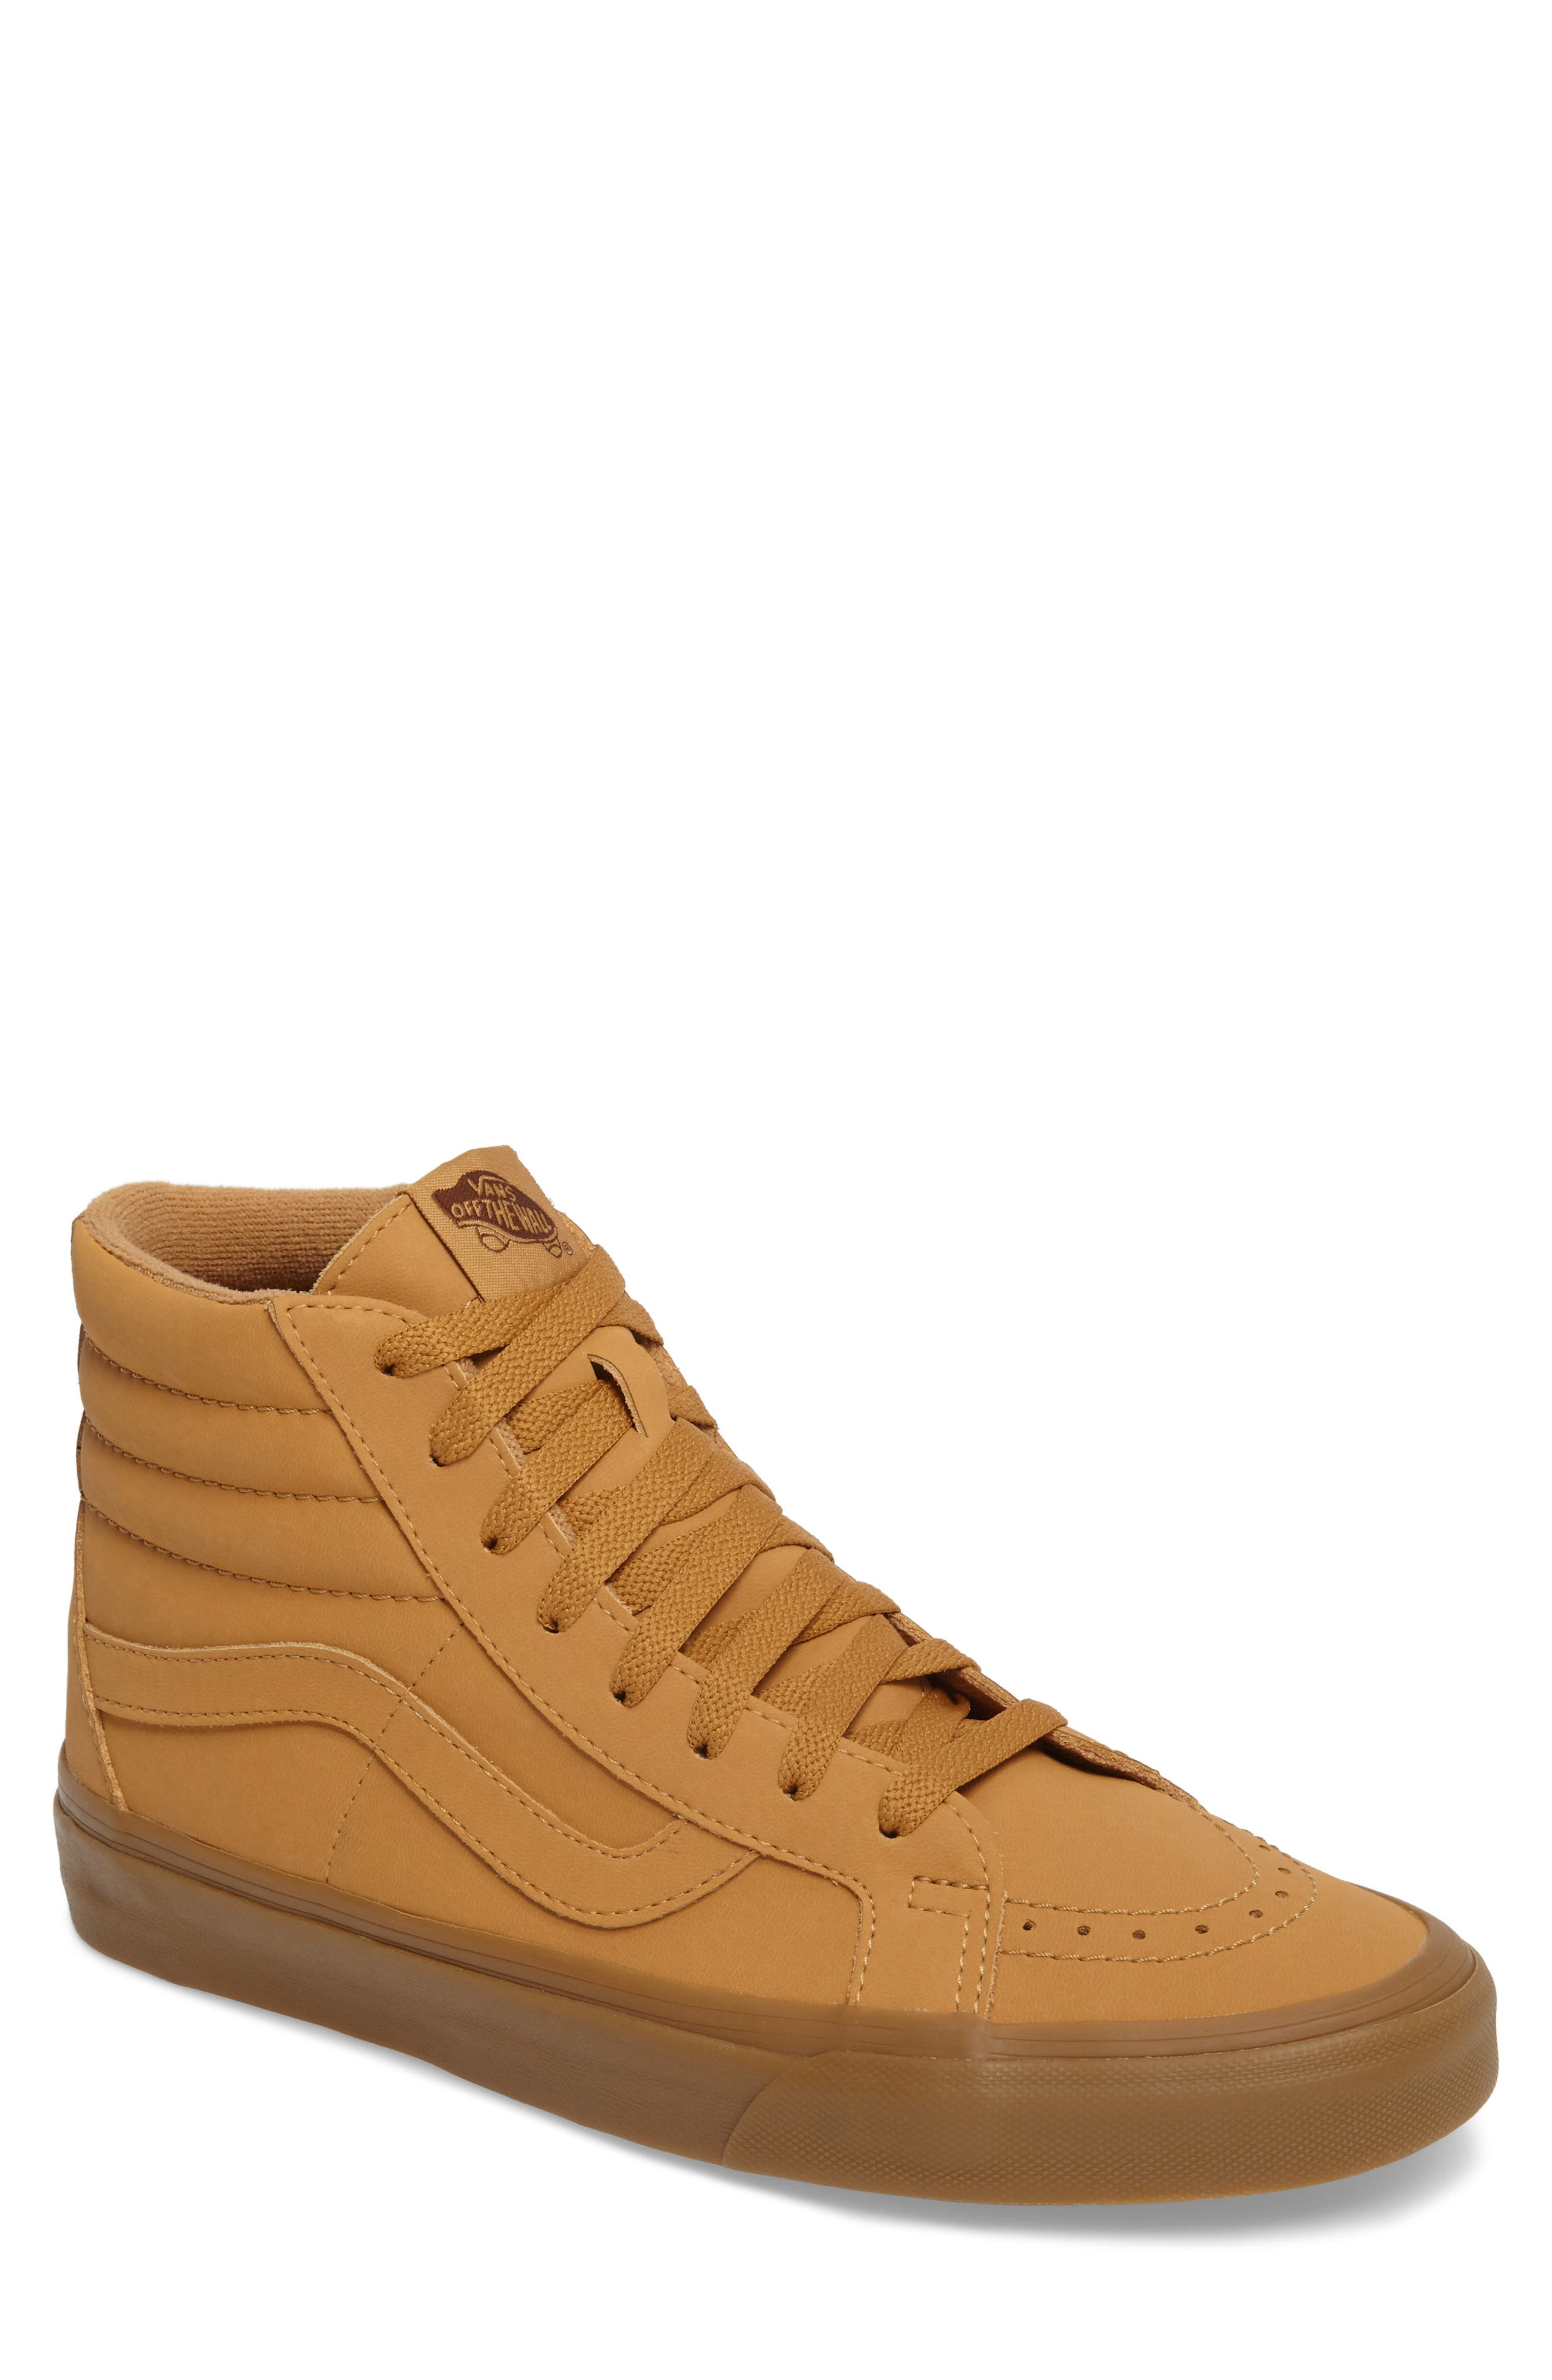 'Sk8-Hi Reissue' Sneaker,                         Main,                         color, Light Gum/ Mono Canvas/Leather